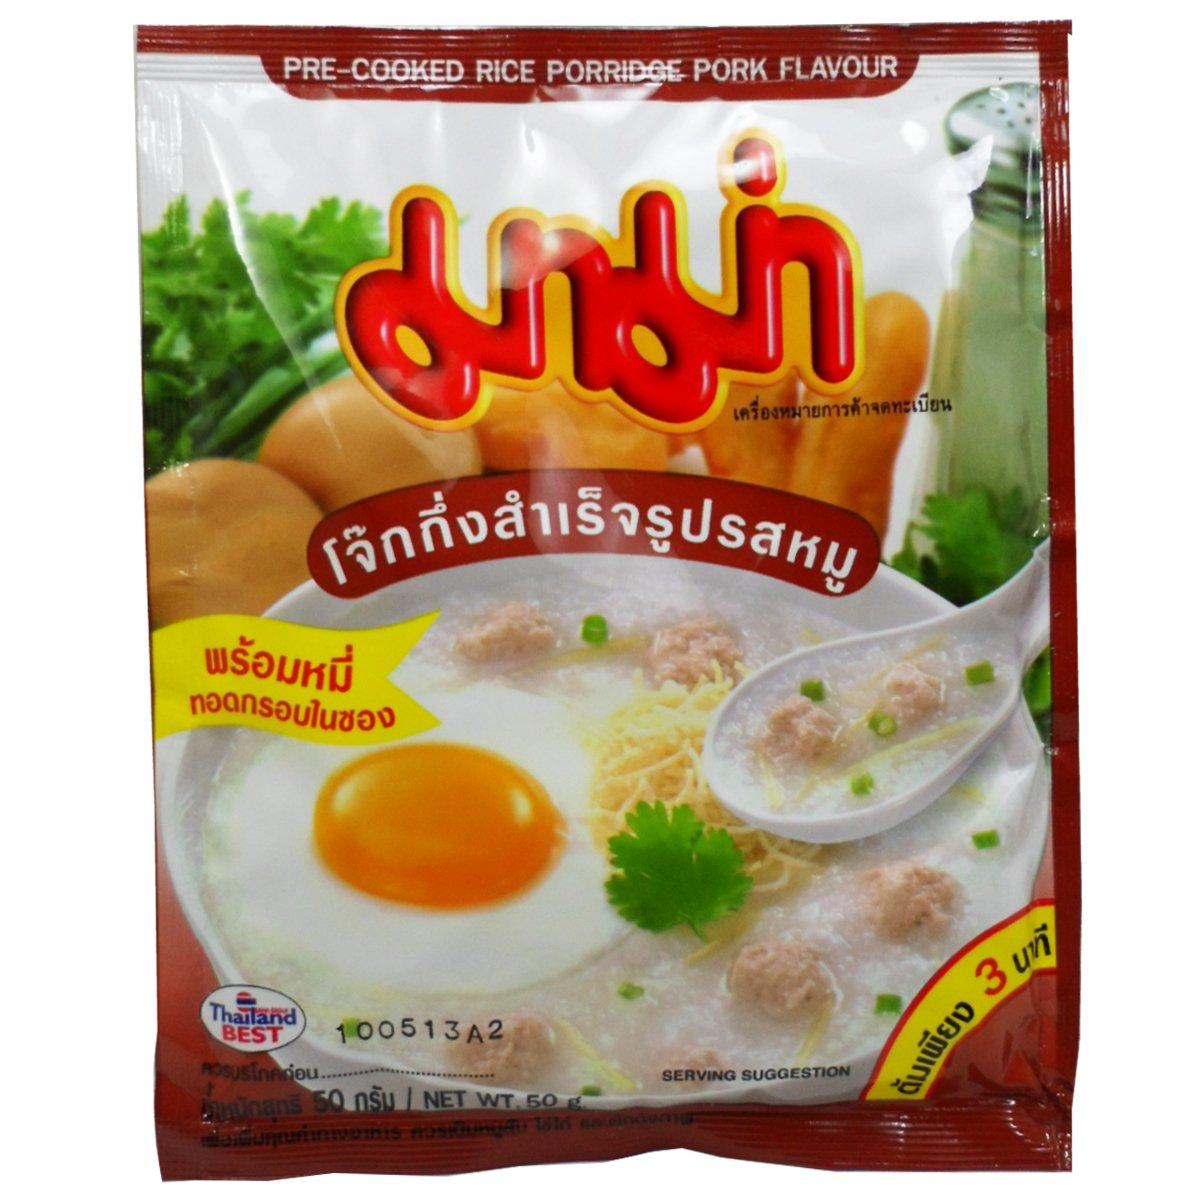 Mama Pre-cooked Rice Porridge (Jook , Congee) Pork Flavour Net Wt 50 G (1.76 Oz) X 3 Bags